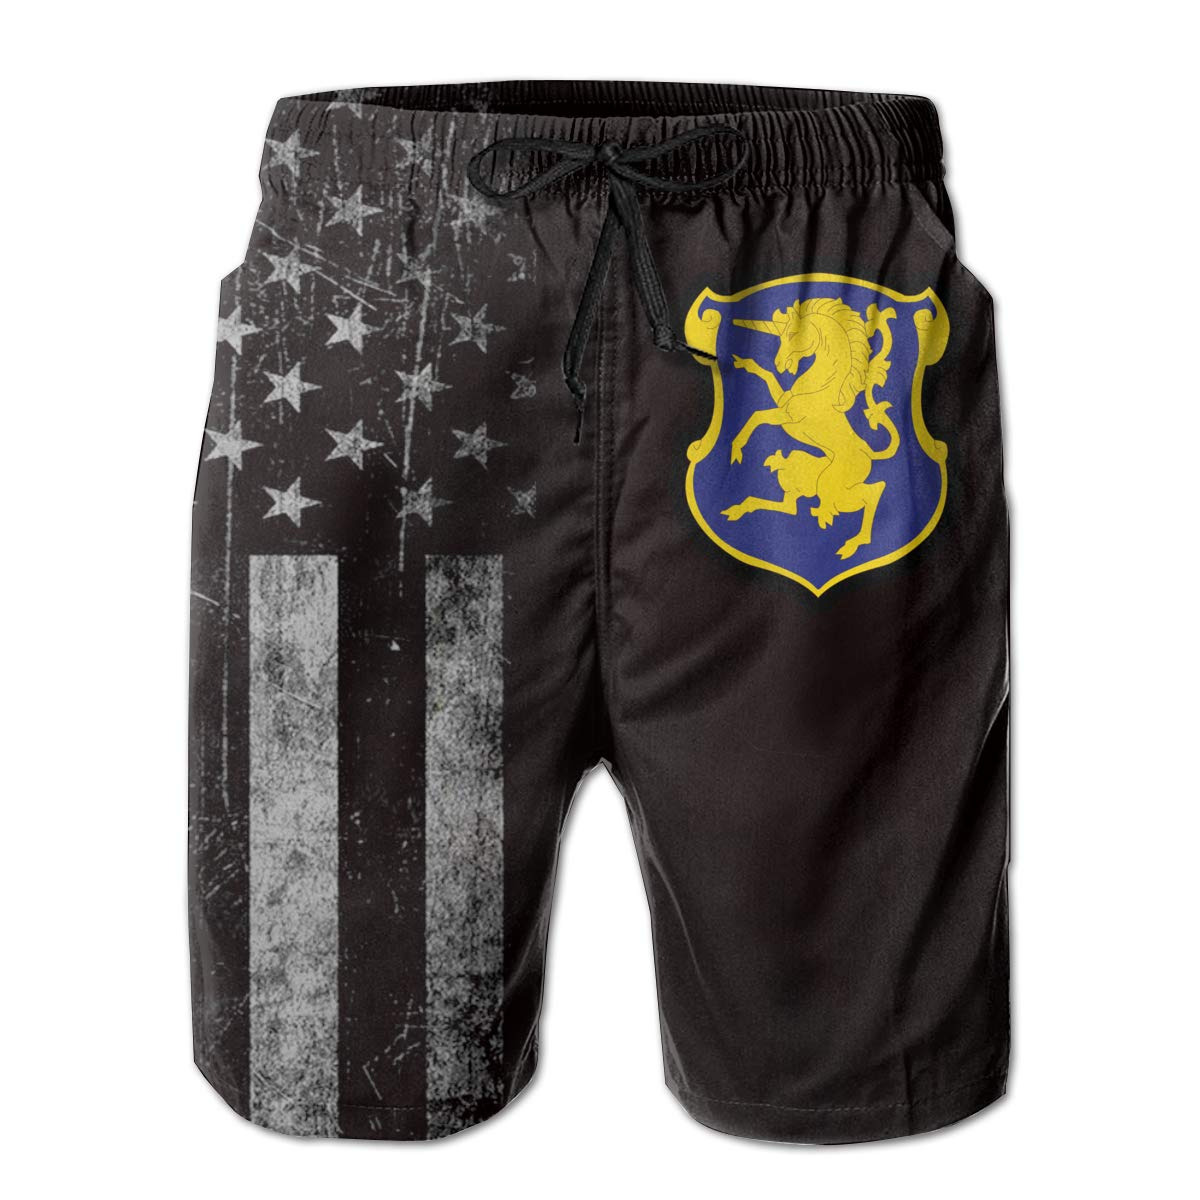 HANINPZ American Flag with 6th Cavalry Regiment Mens Swim Trunks Beach Short Board Shorts